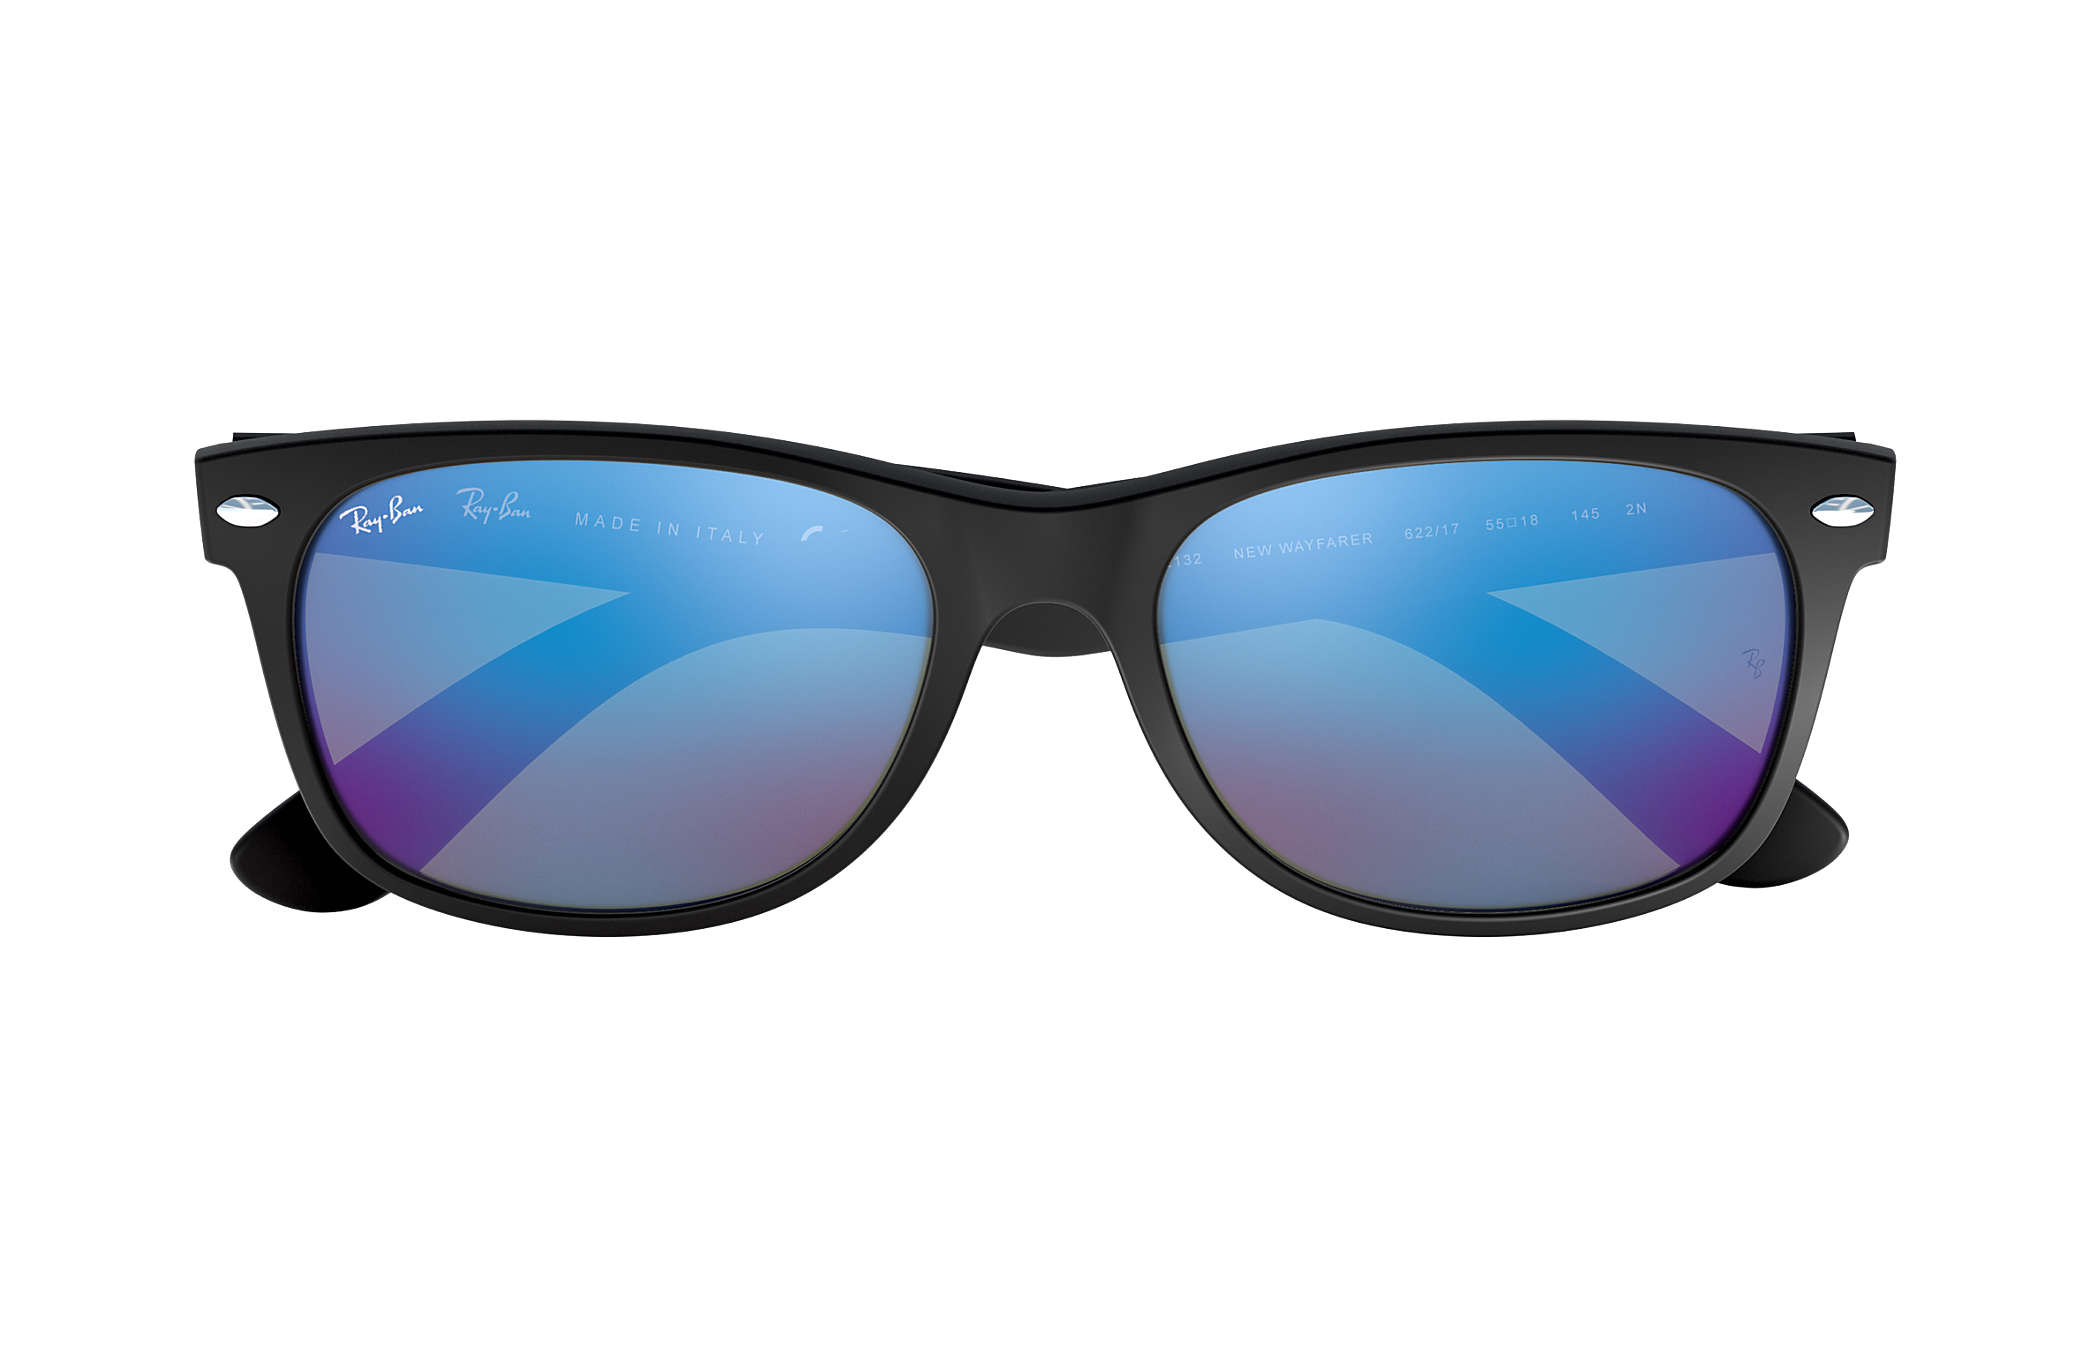 ffb4d579ff Ray-Ban New Wayfarer Flash RB2132 Black - Nylon - Blue Lenses ...